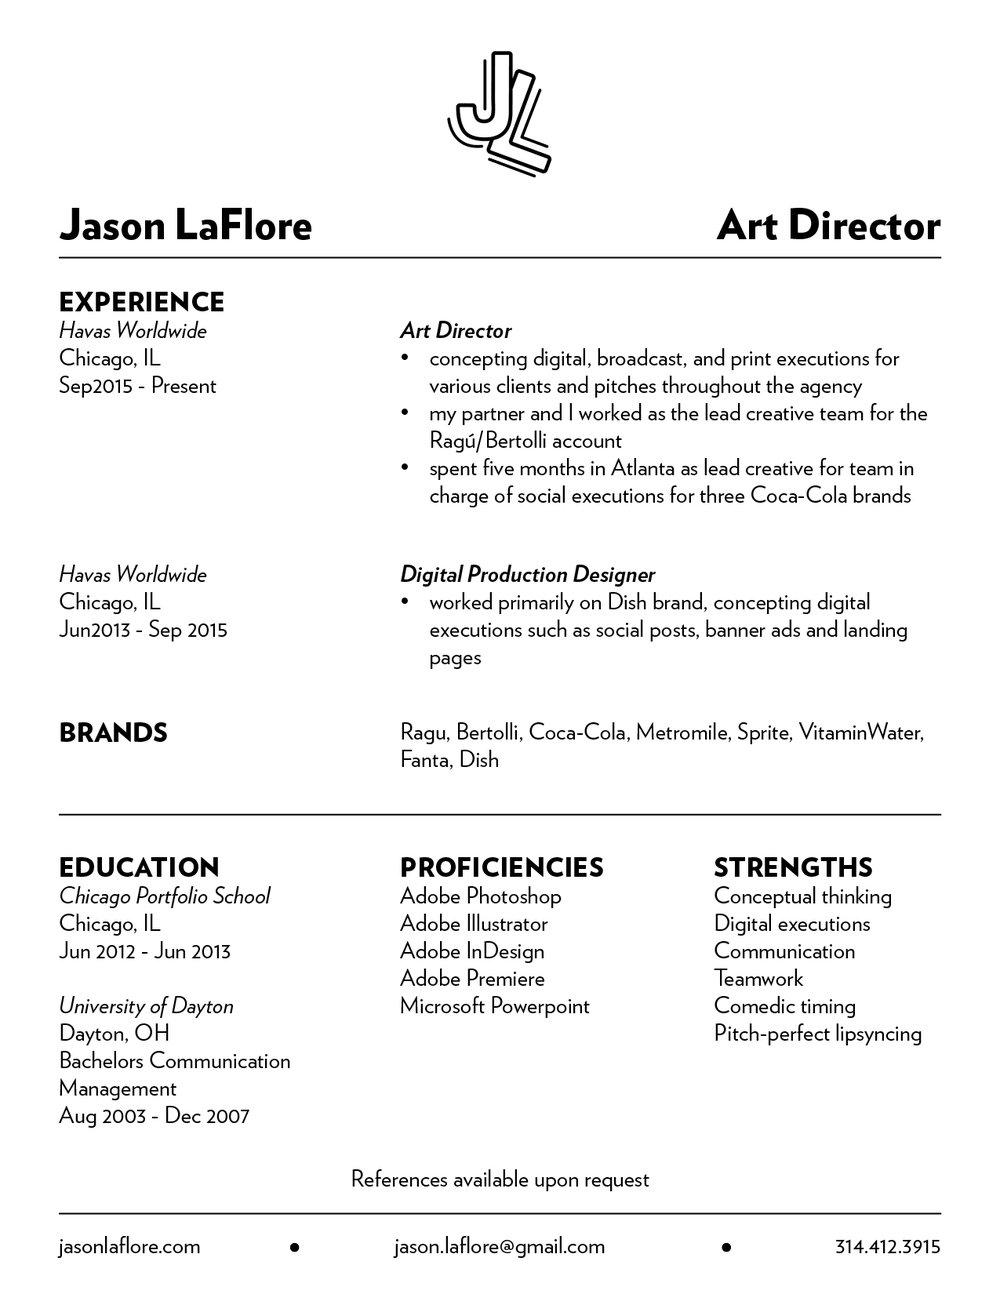 resume jason laflore